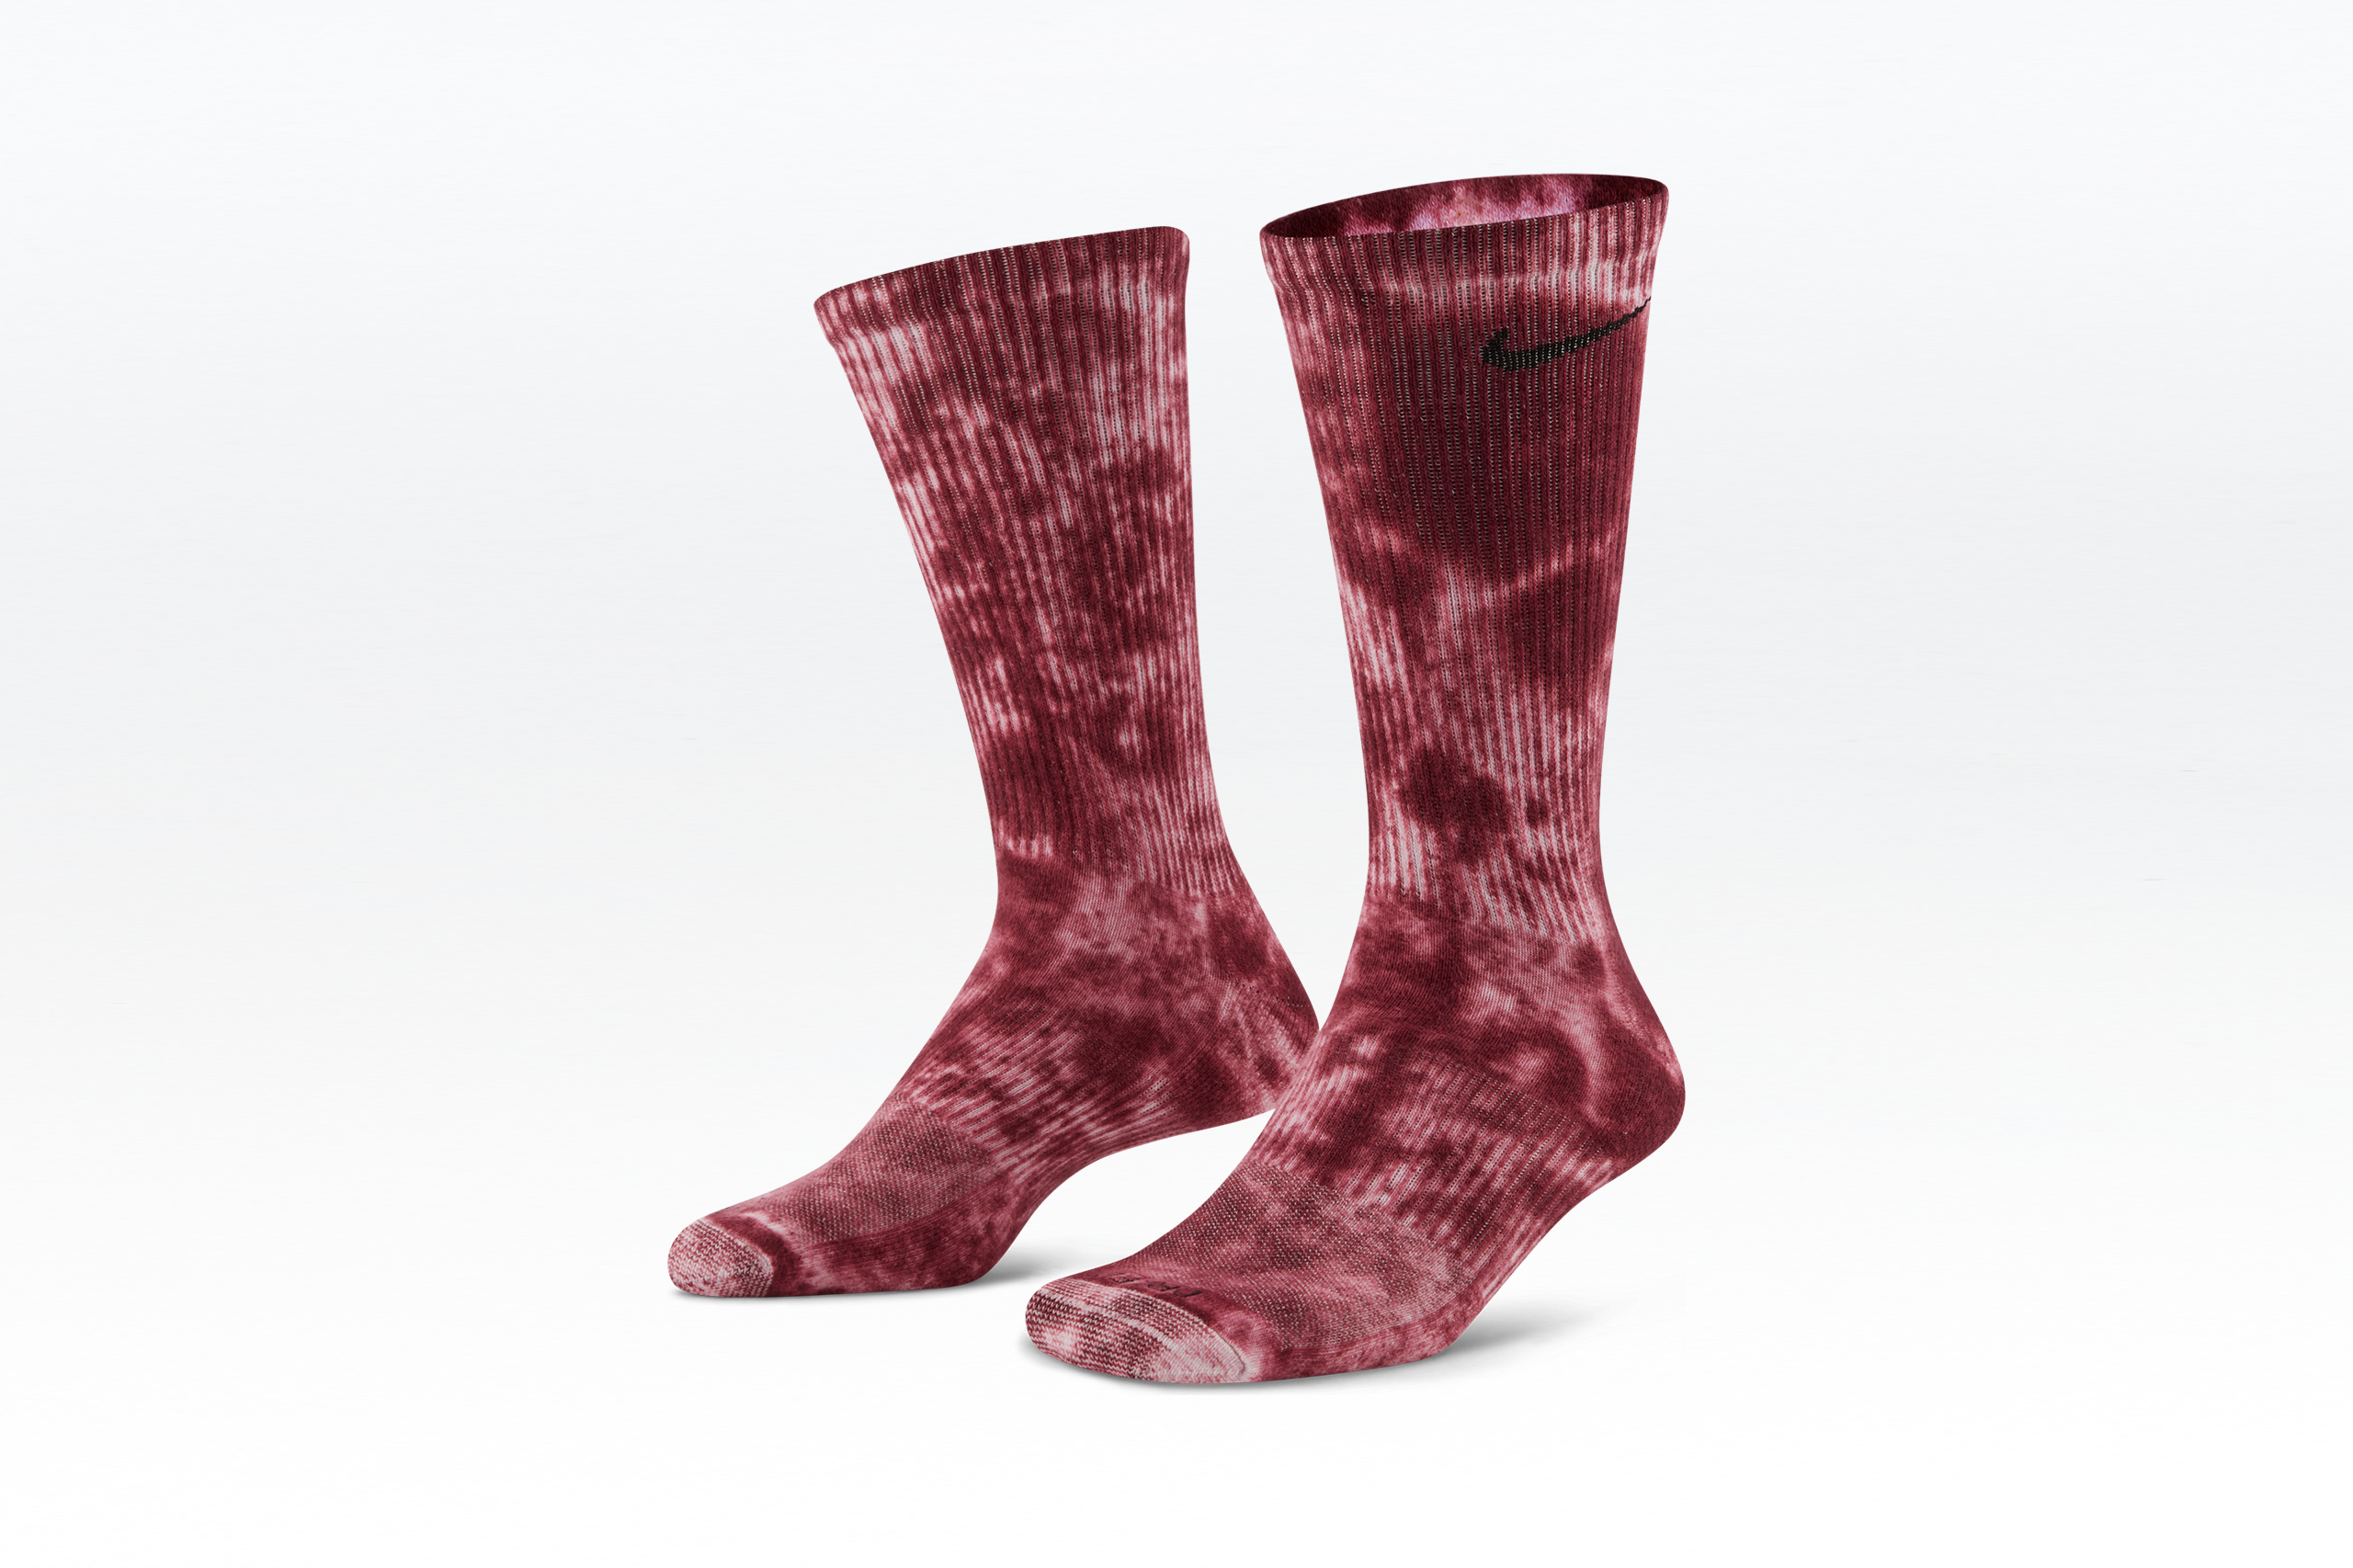 Nike Everyday Cushion Crew Socks Tie Dye Multicolor